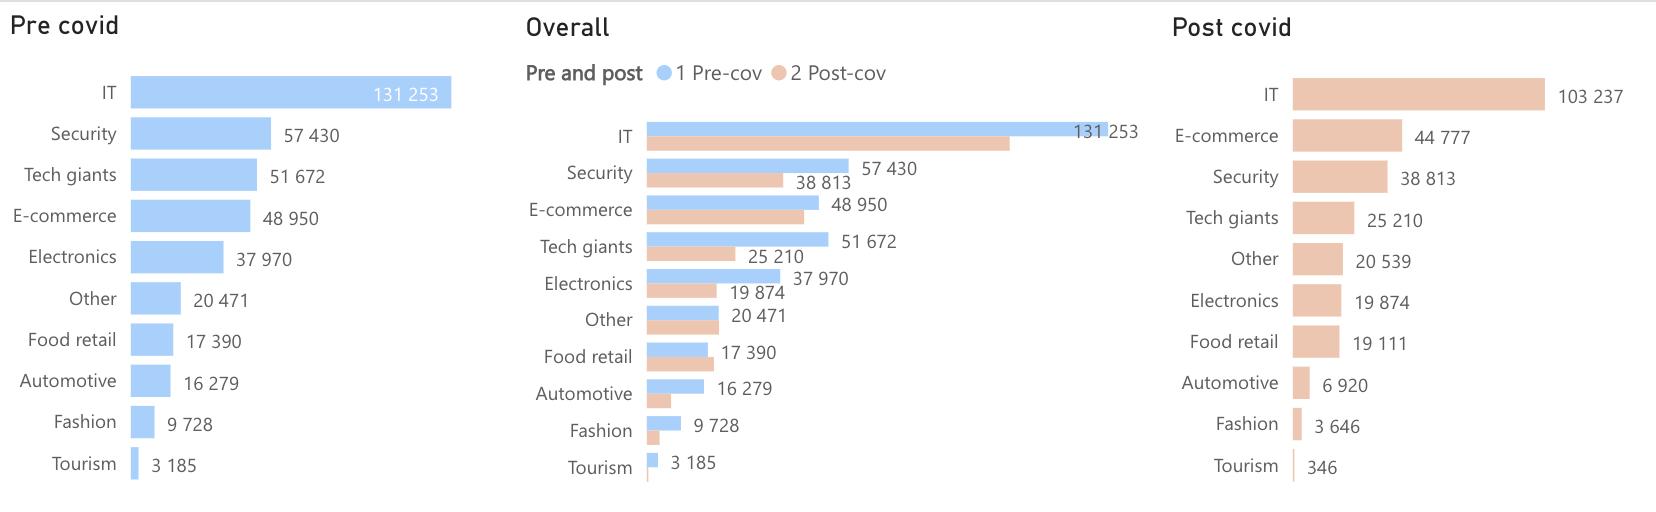 job posting per week by industries: Pre-covid VS Post-covid